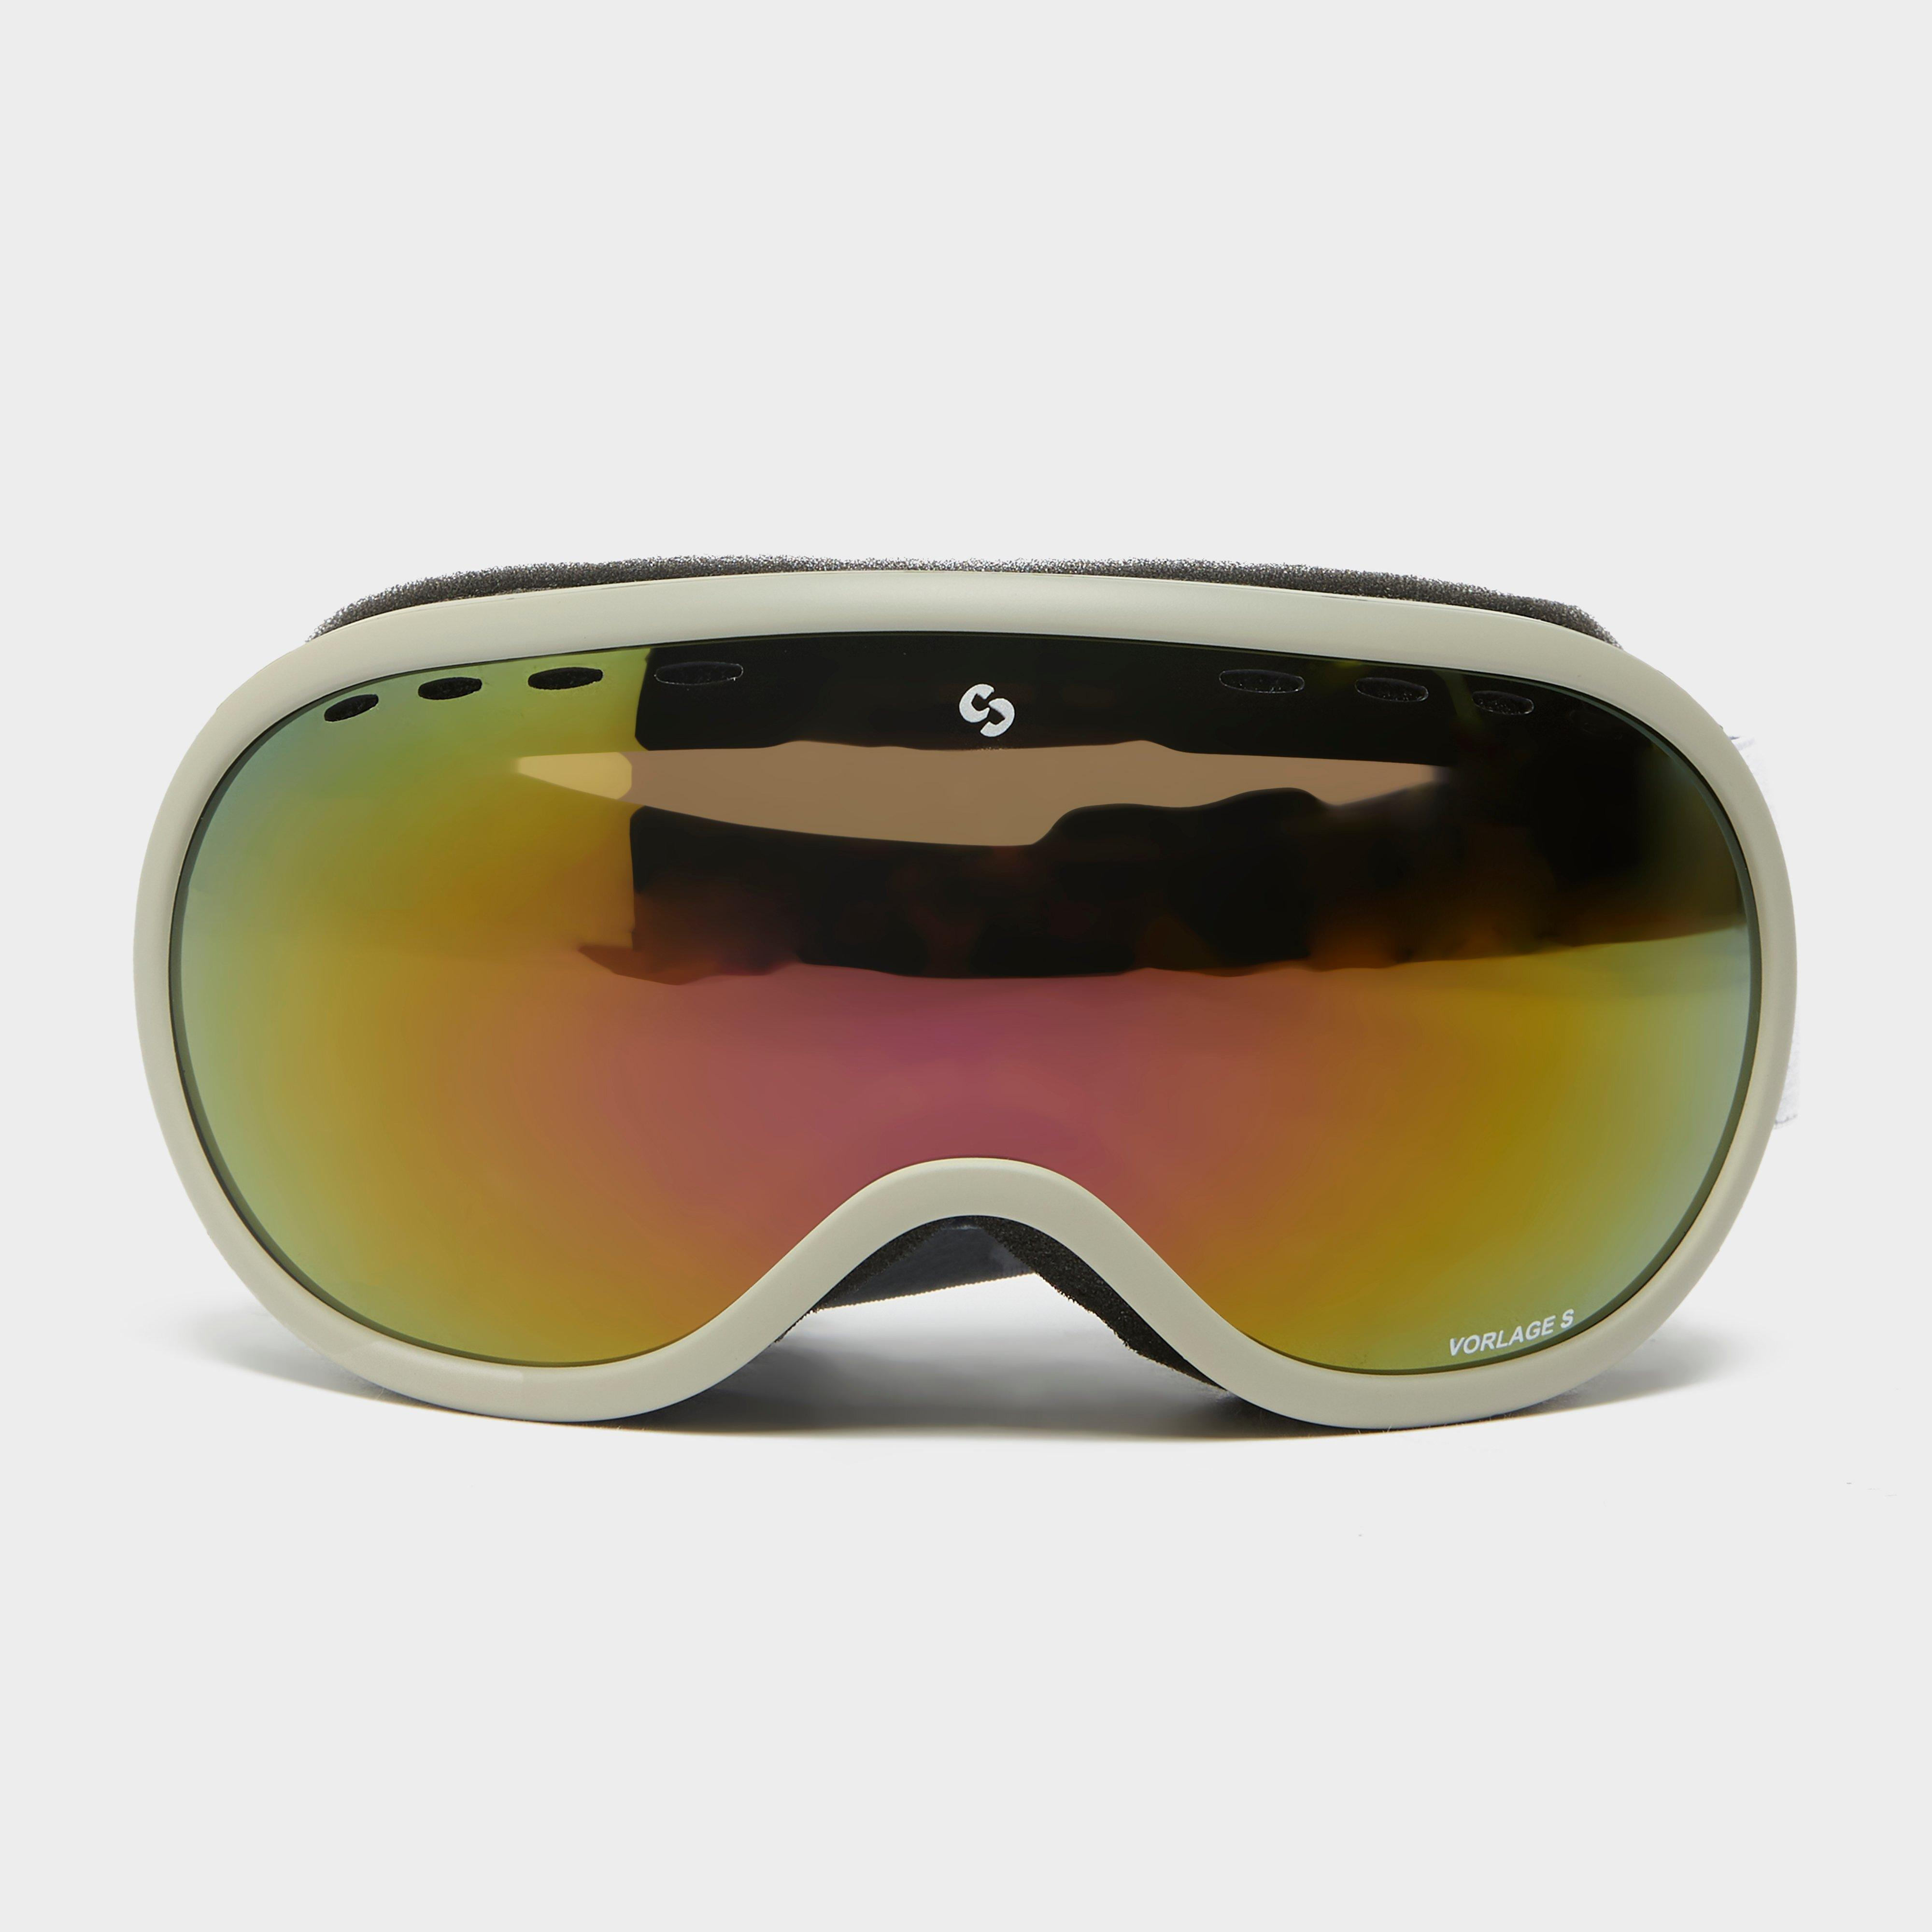 Sinner Vorlage Ski Goggles - Grey/gry/red  Grey/gry/red